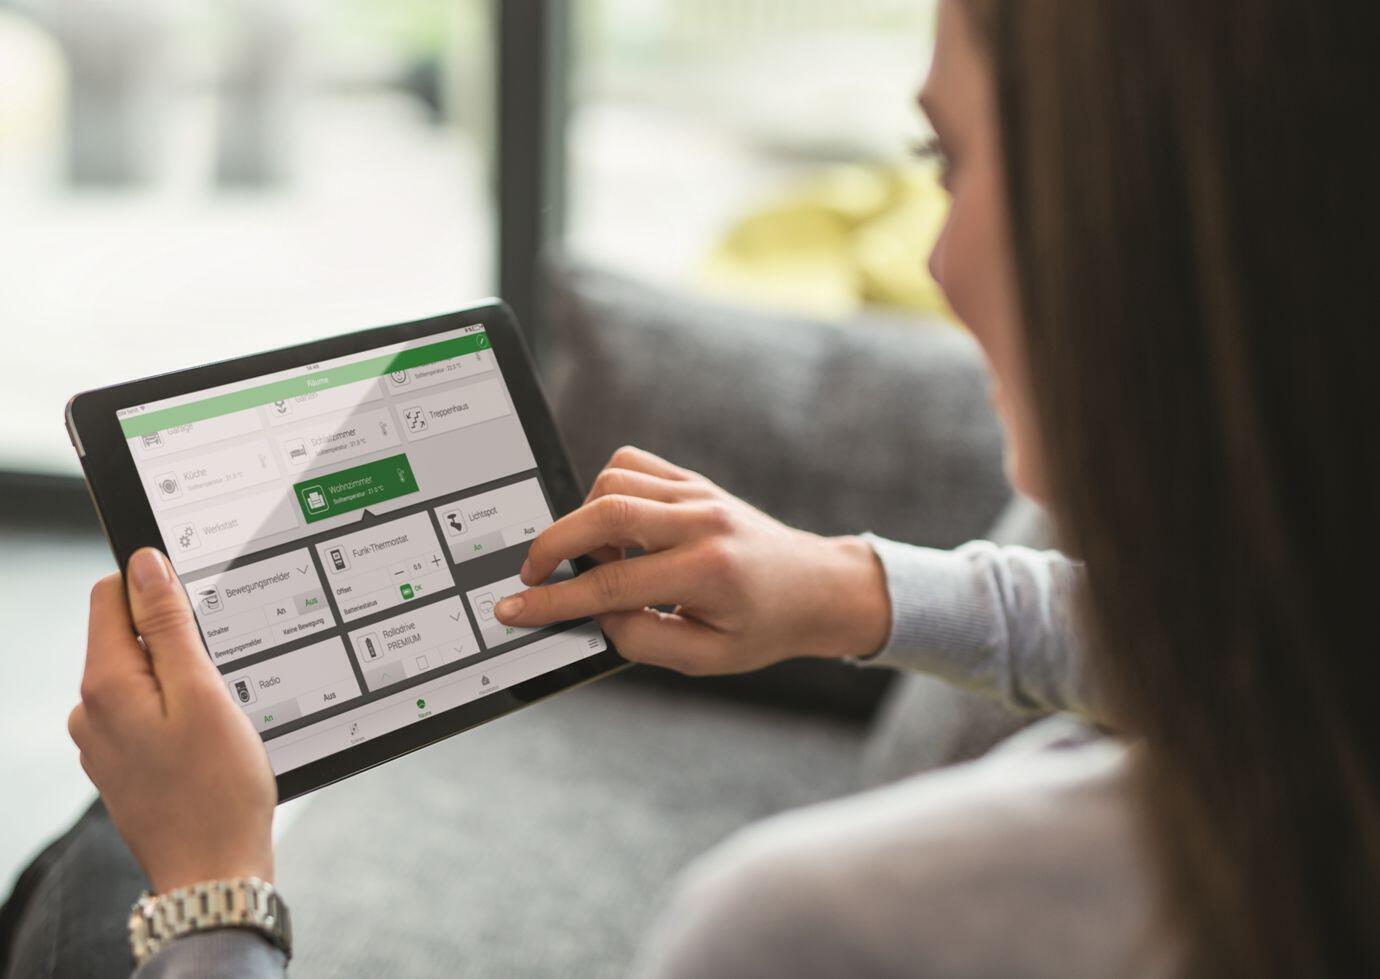 smart-home-smart-friends-frau-mit-tablet.jpg